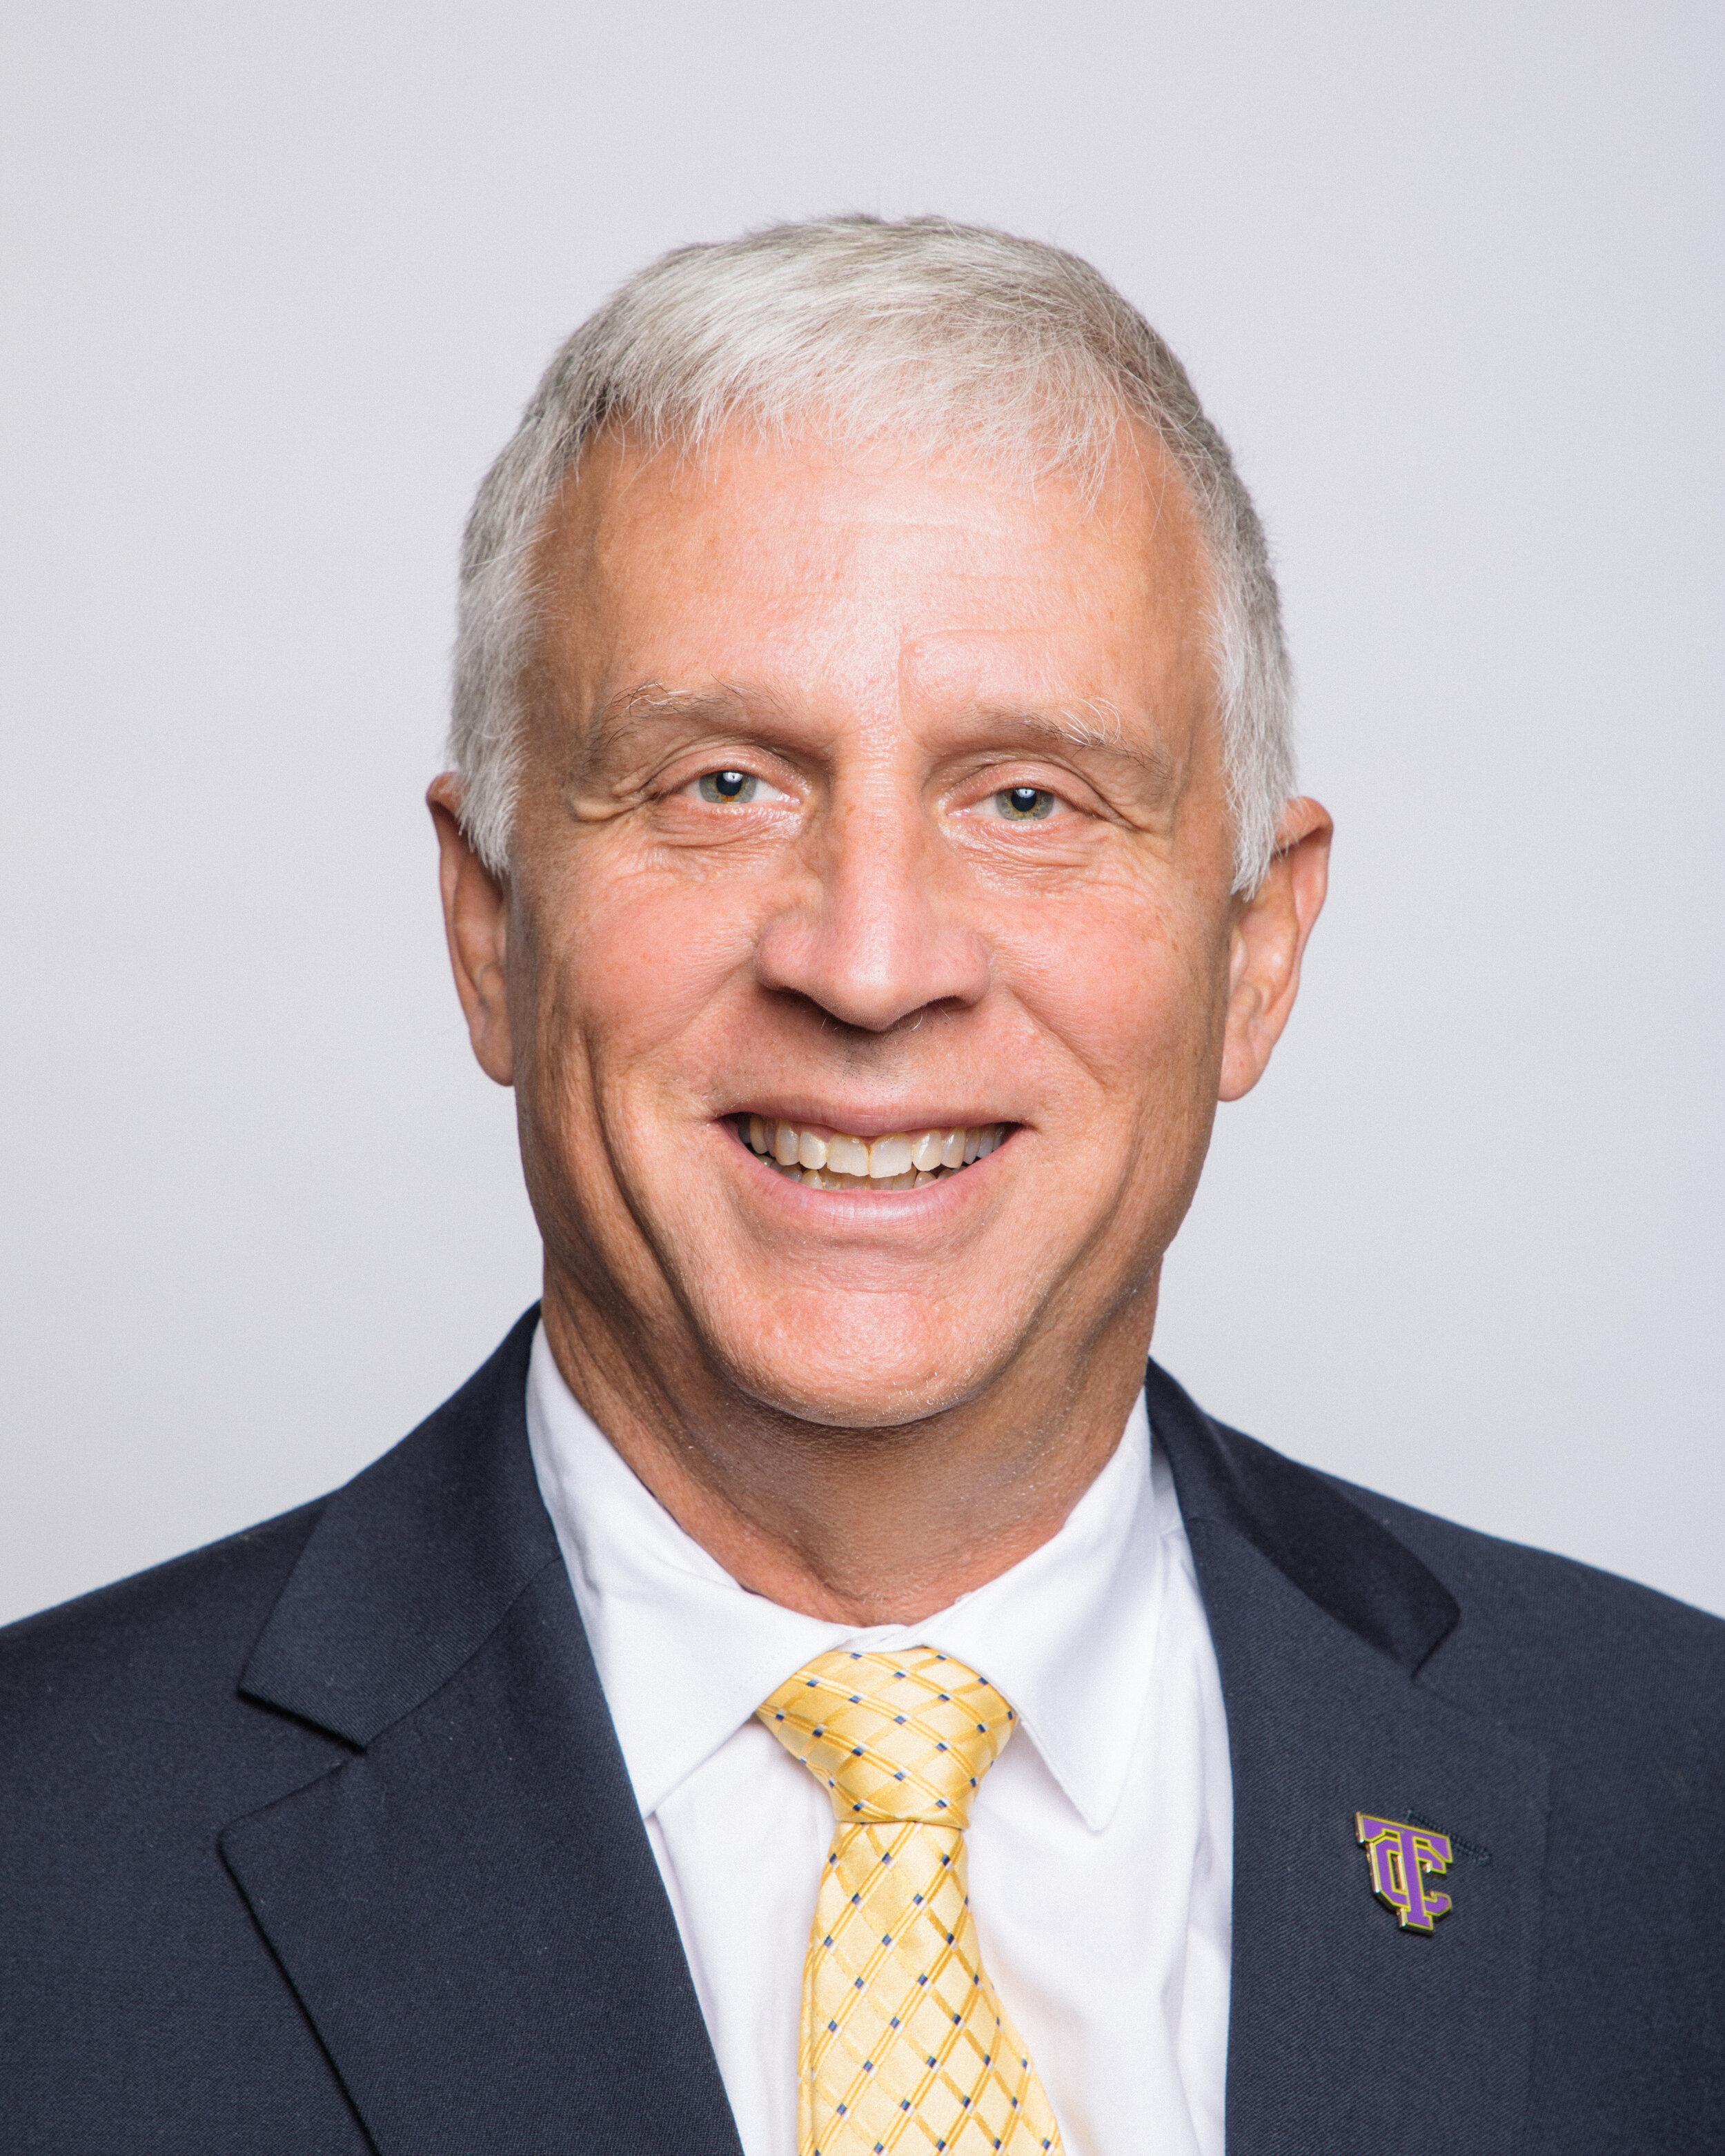 "Dr. Clint Satterfield#<a href=""http://www.tcschools.org/""><font color=""9e0519"">Trousdale County Schools</font></a>"